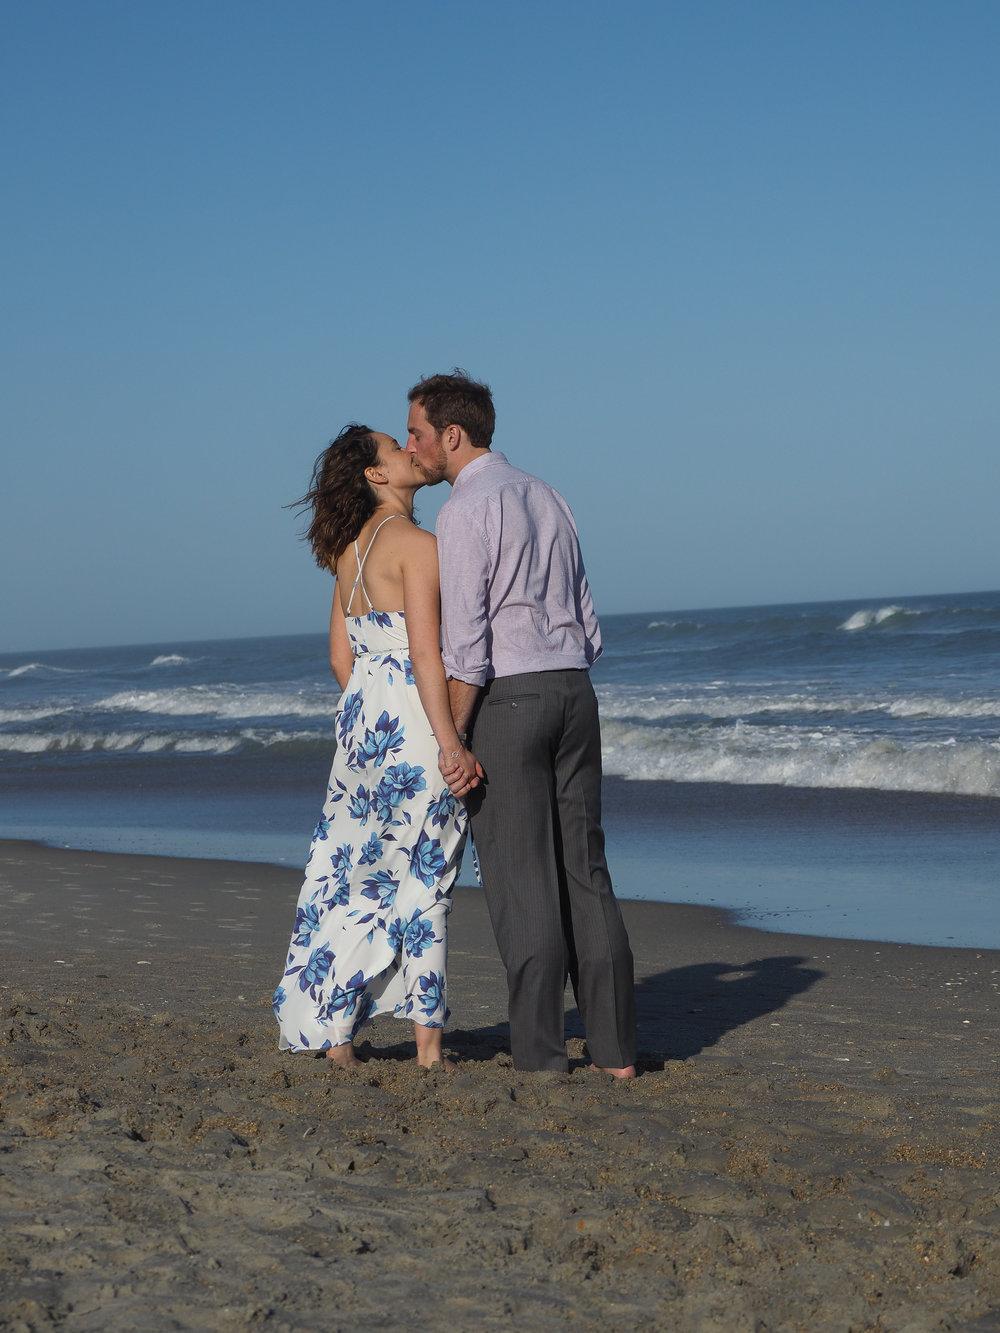 - A walk on the beach, sharing a romantic moment. Wrightsville Beach, NC. Billy Beach Photography.